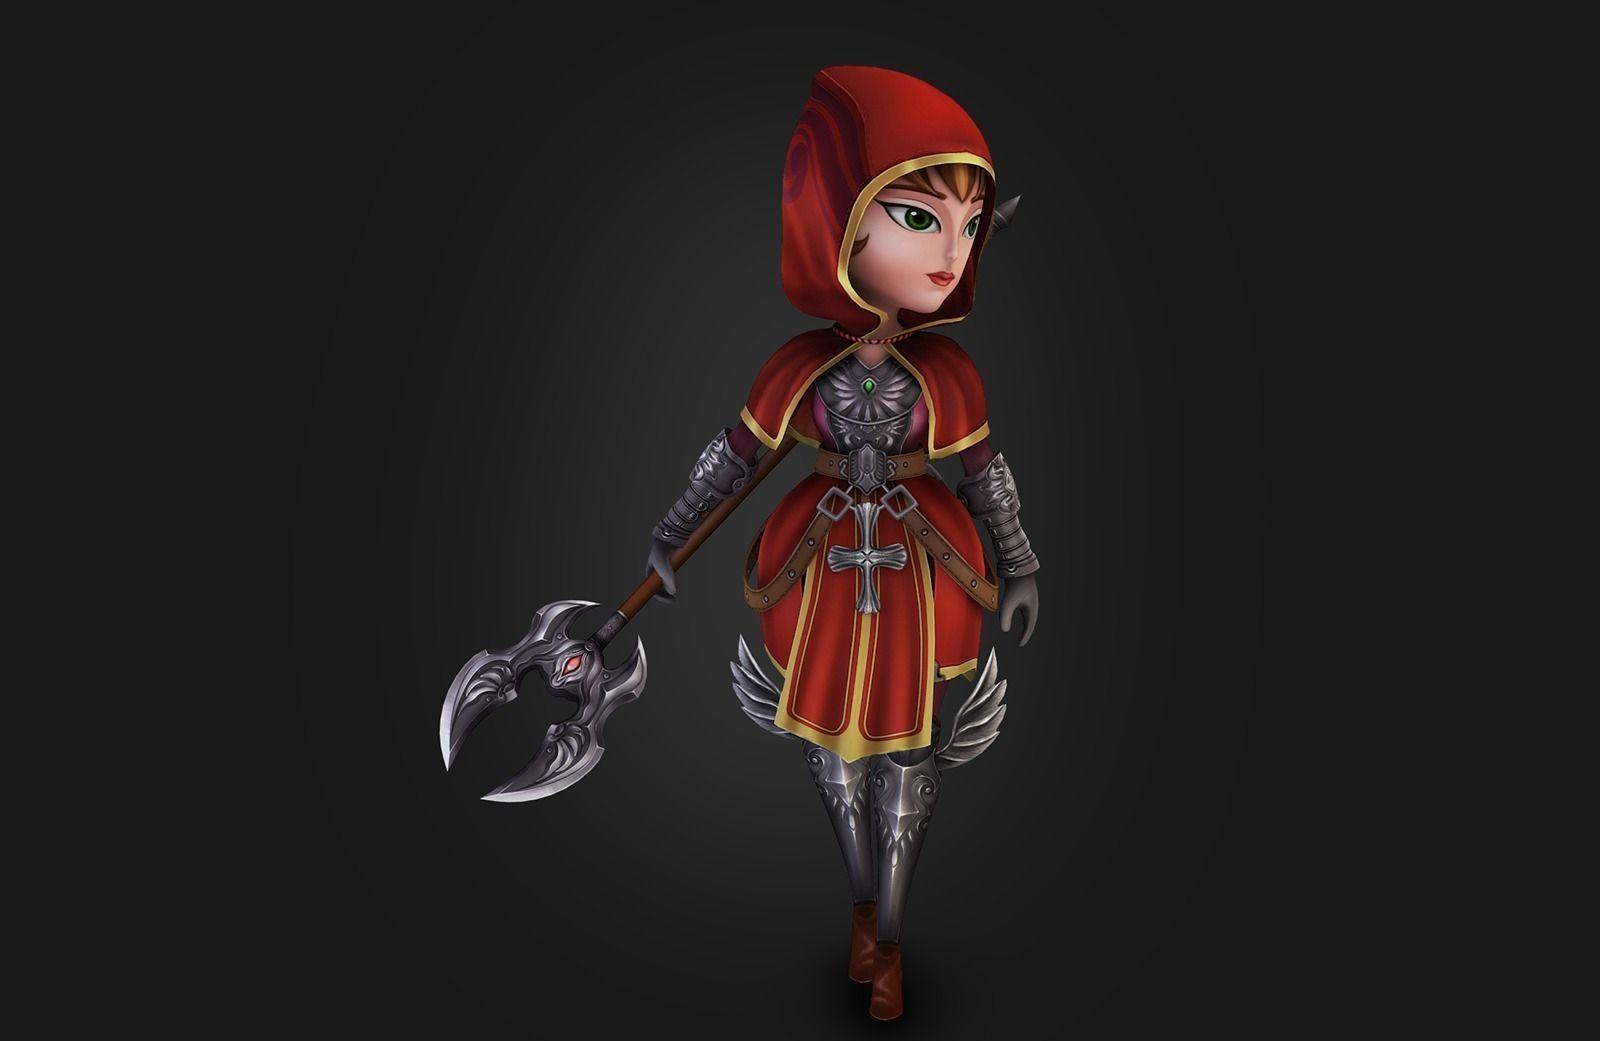 Medieval Chibi Warrior Free Vr Ar Low Poly 3d Model